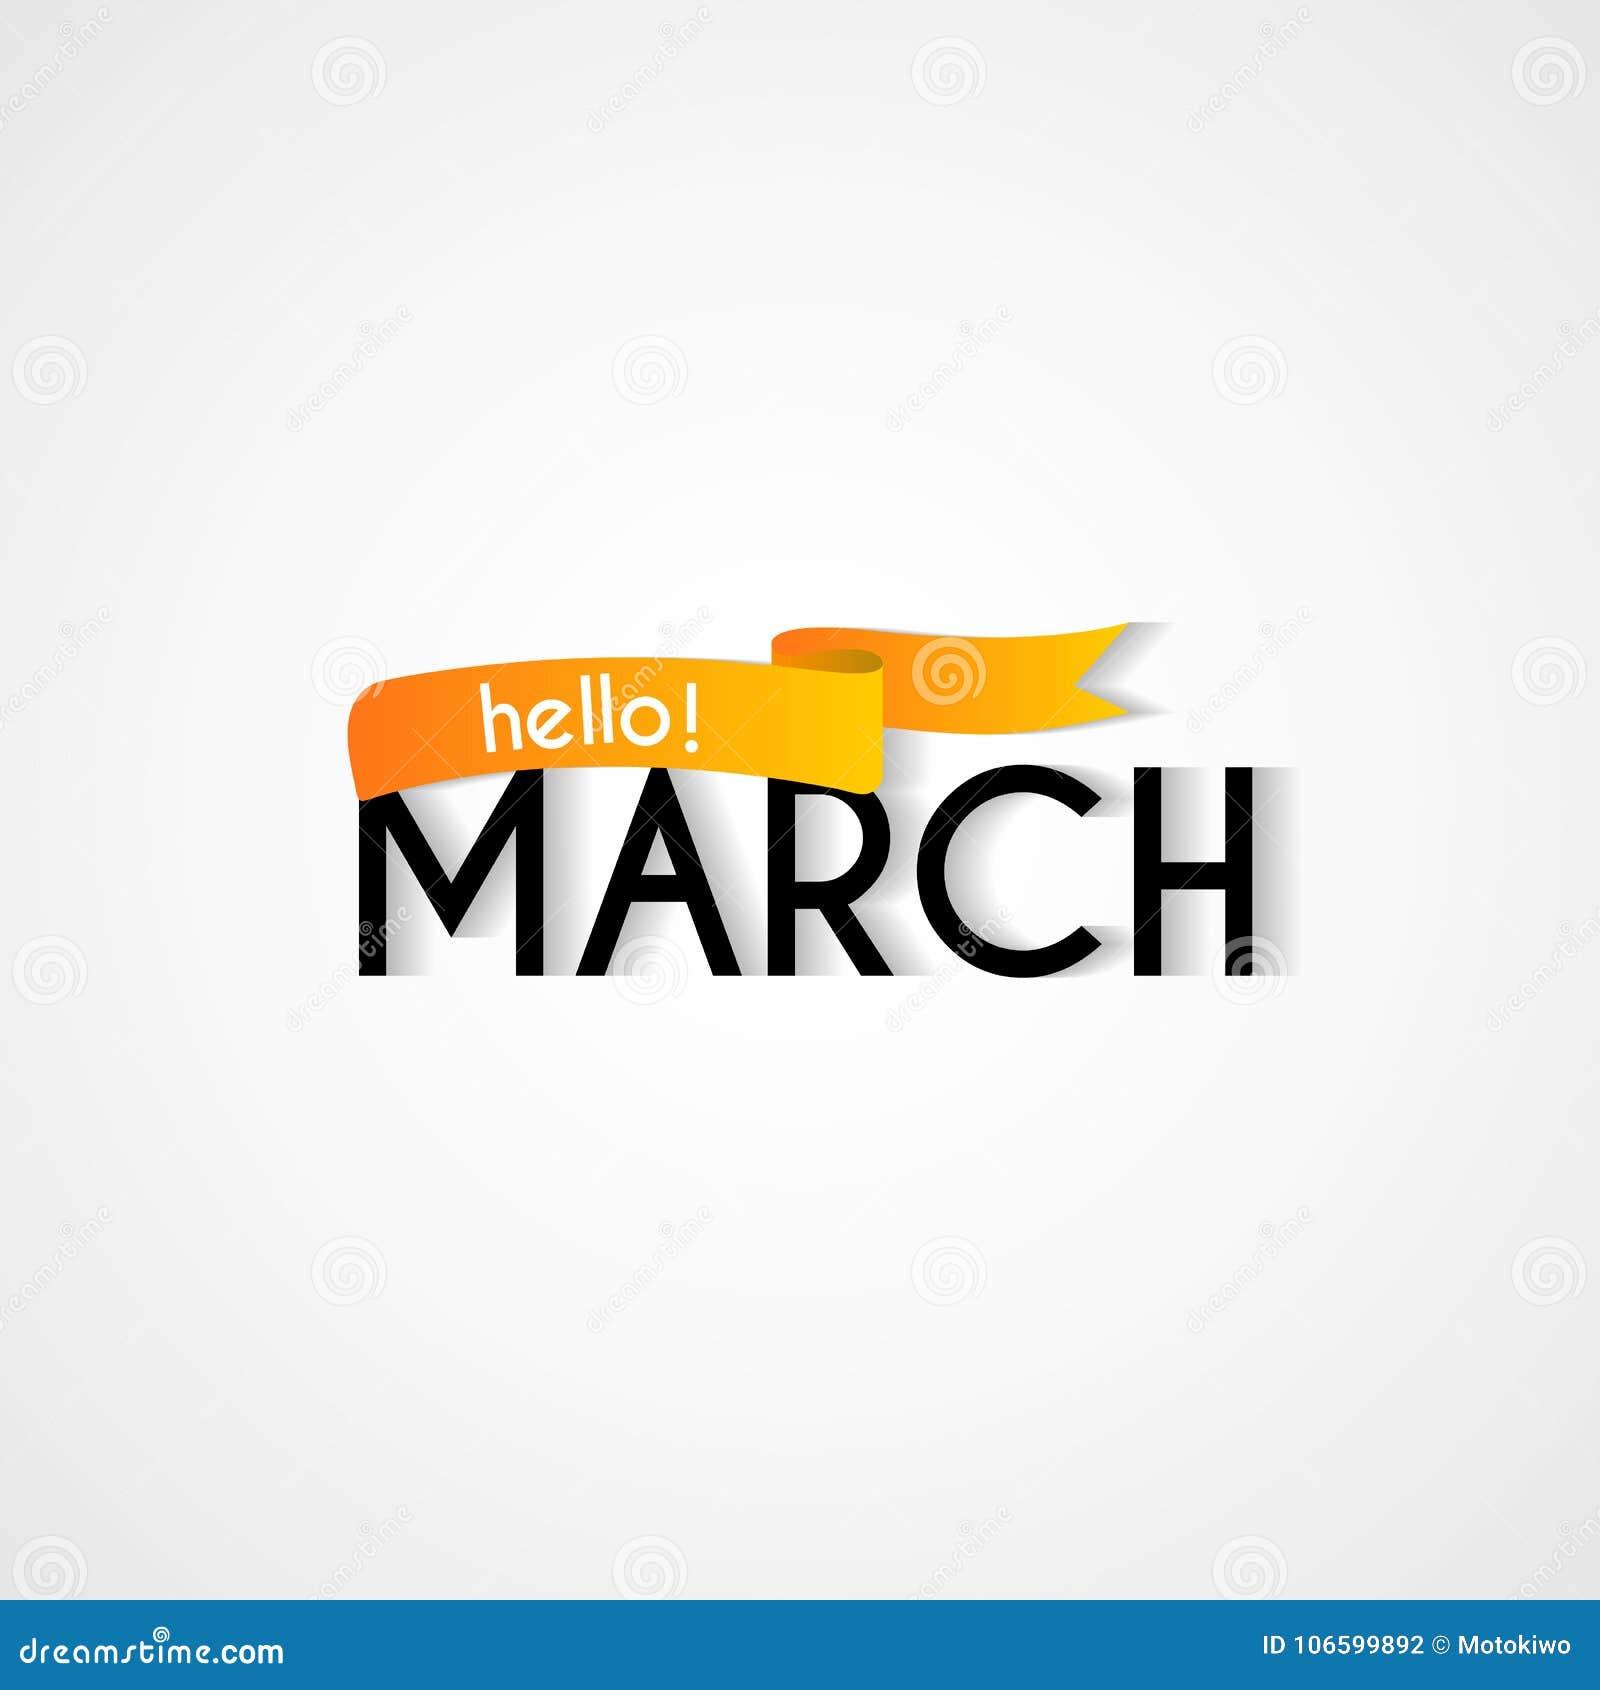 Happy new month march background design stock illustration happy new month march background design m4hsunfo